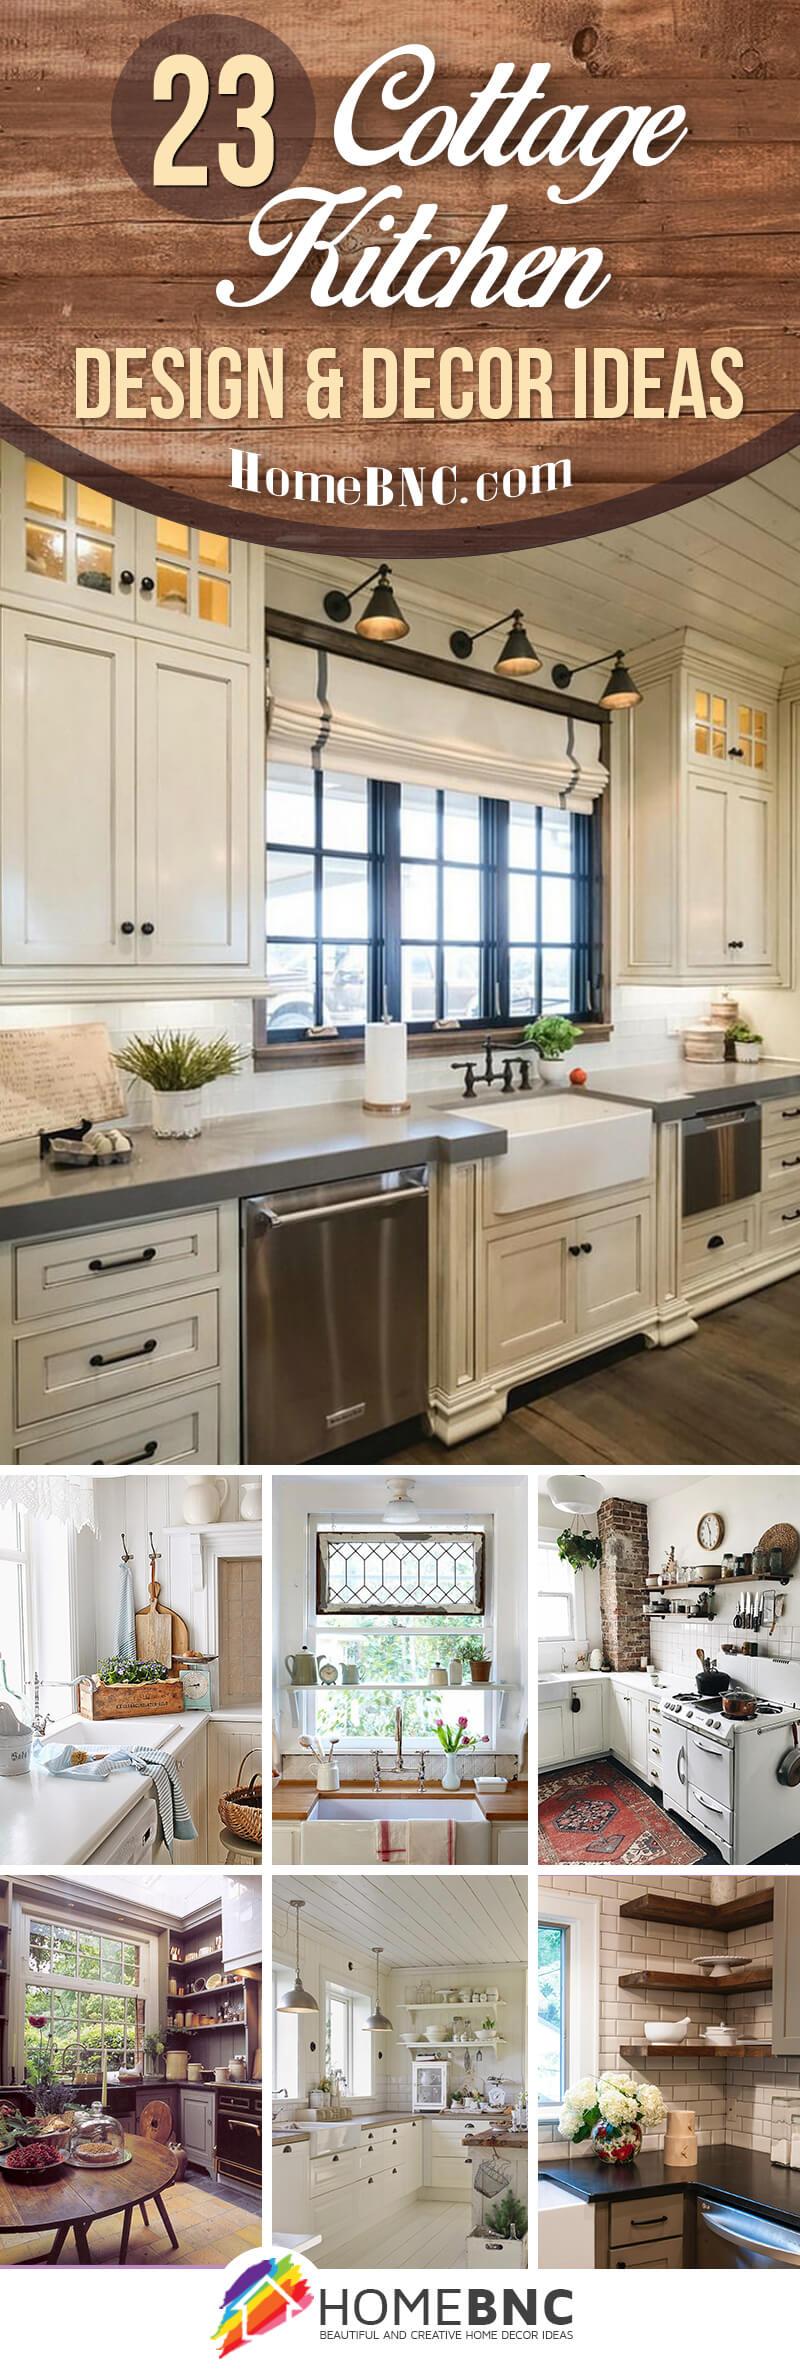 Cottage Kitchen Design Decorating Ideas Pinterest Share Homebnc Rina Watt Blogger Home Decor Diy And Recipes